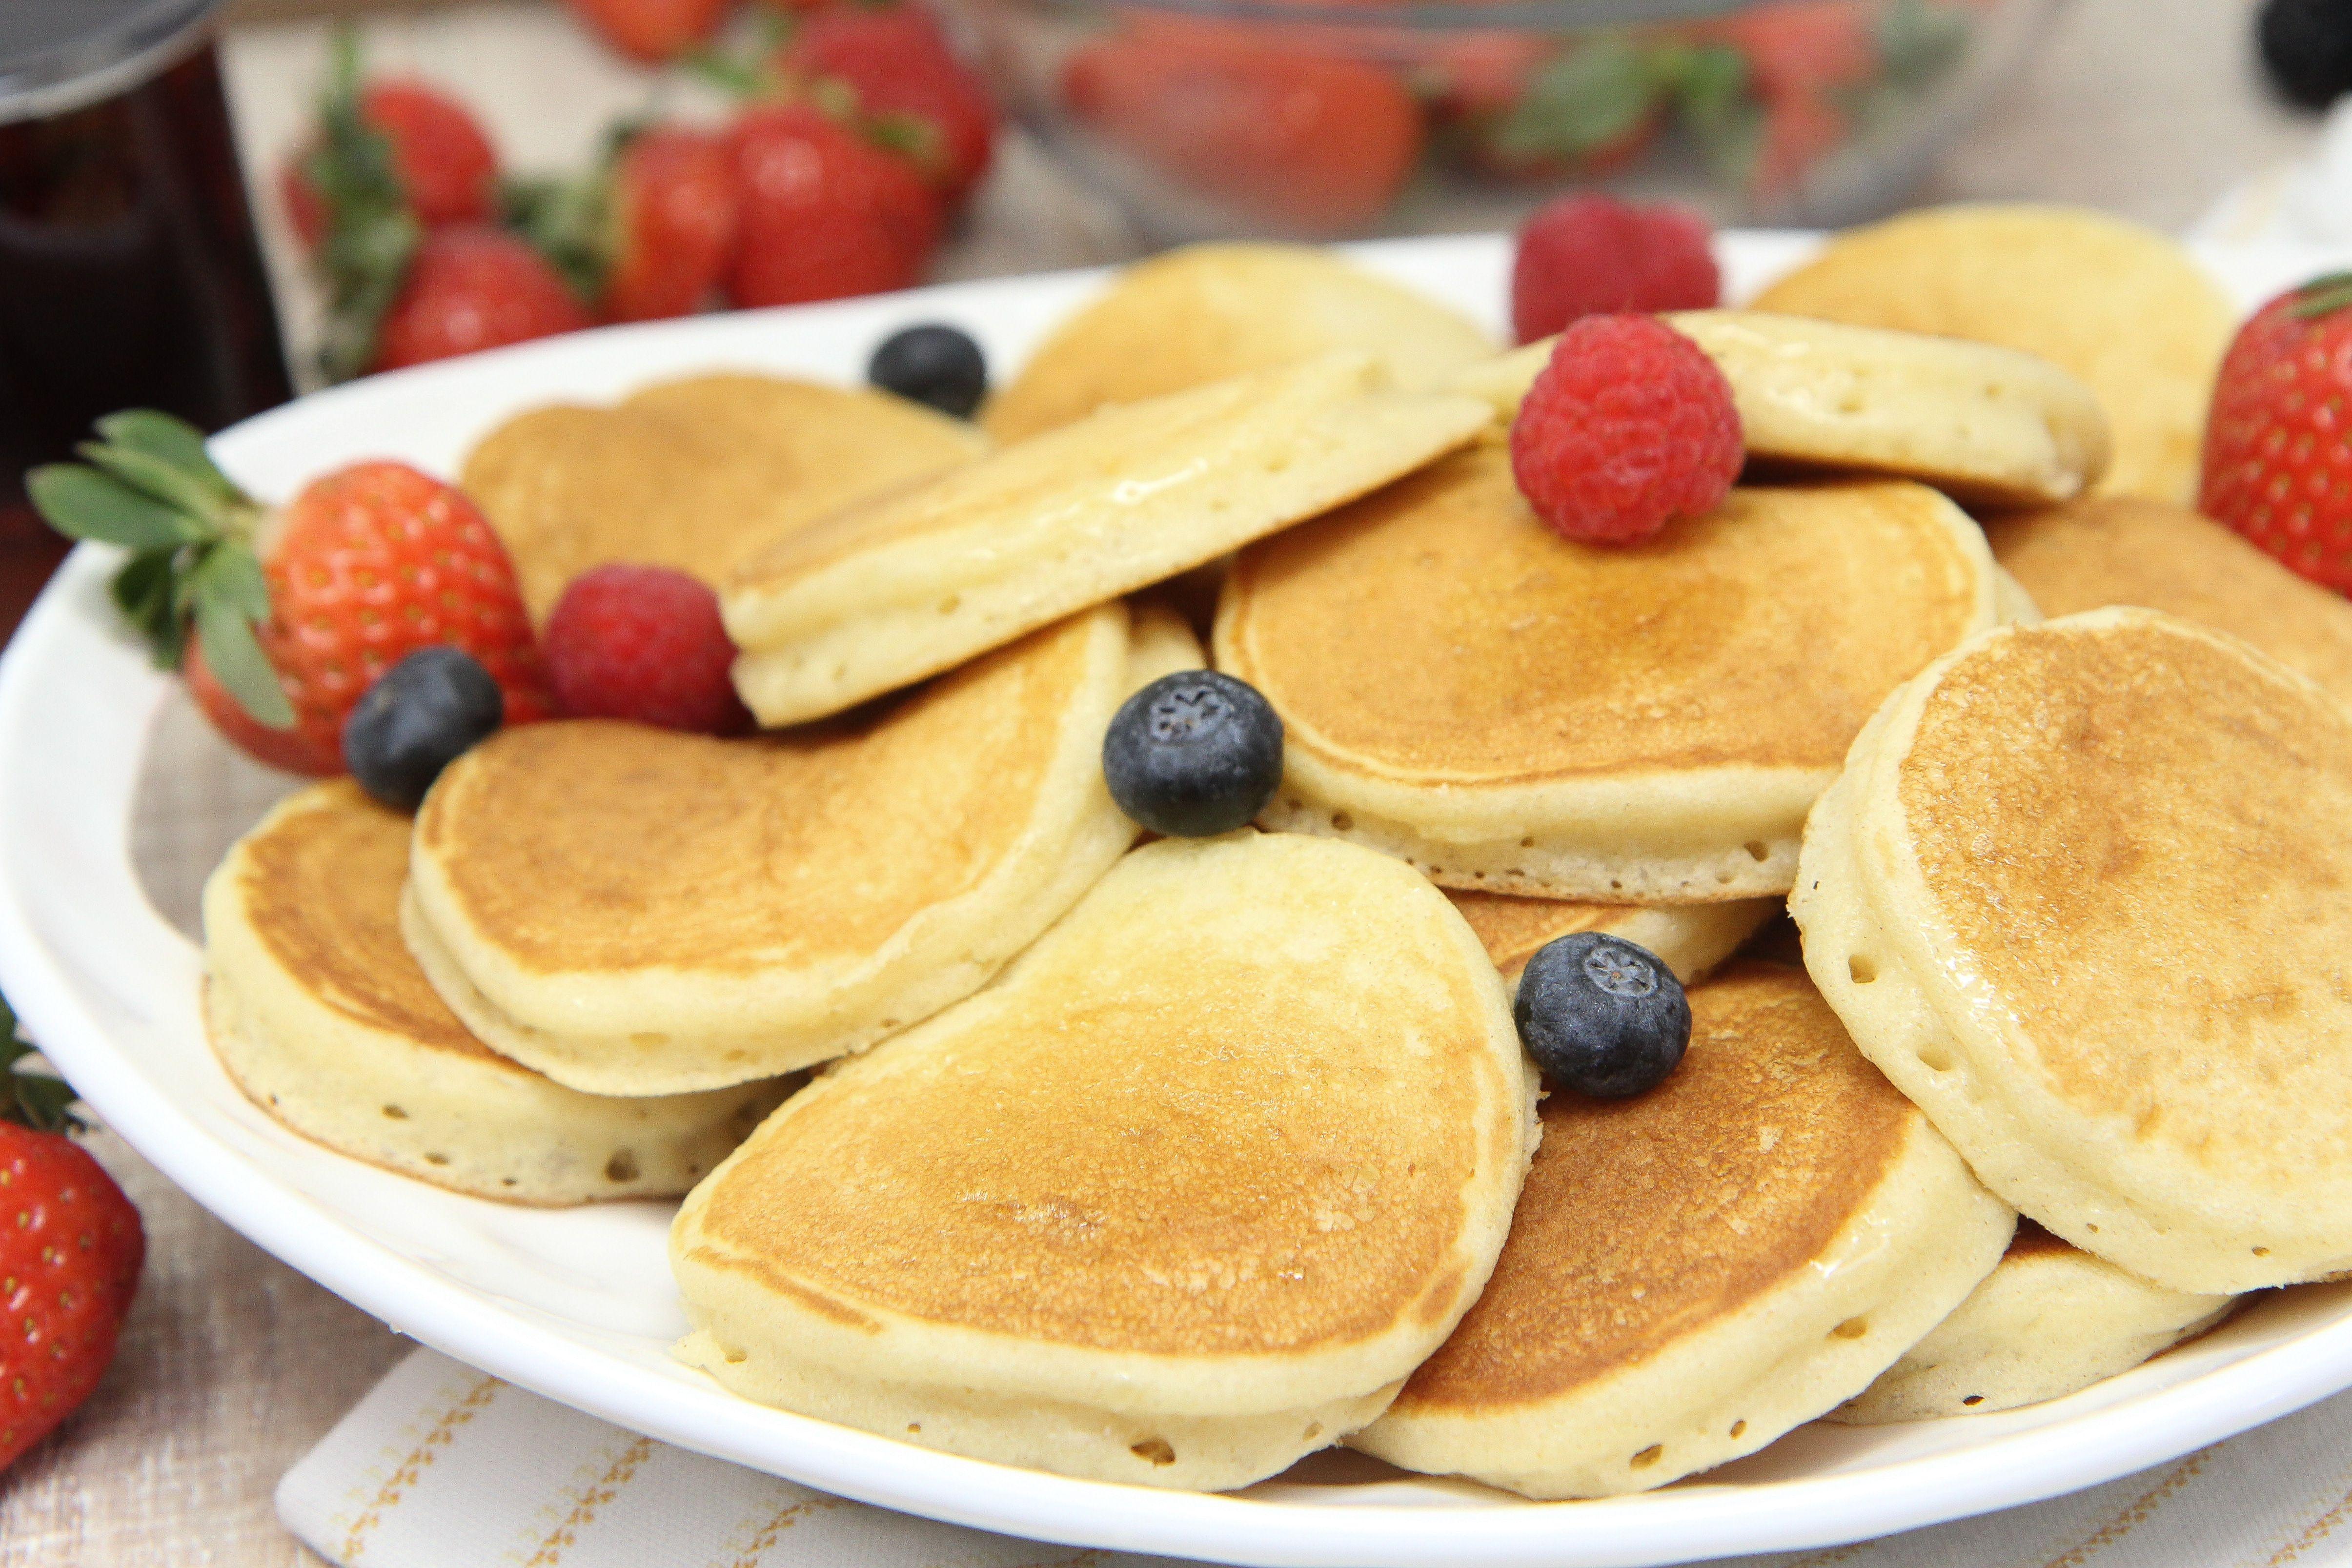 b3322affee4147bea78e2d0cd7337b97 - Recetas Pancakes